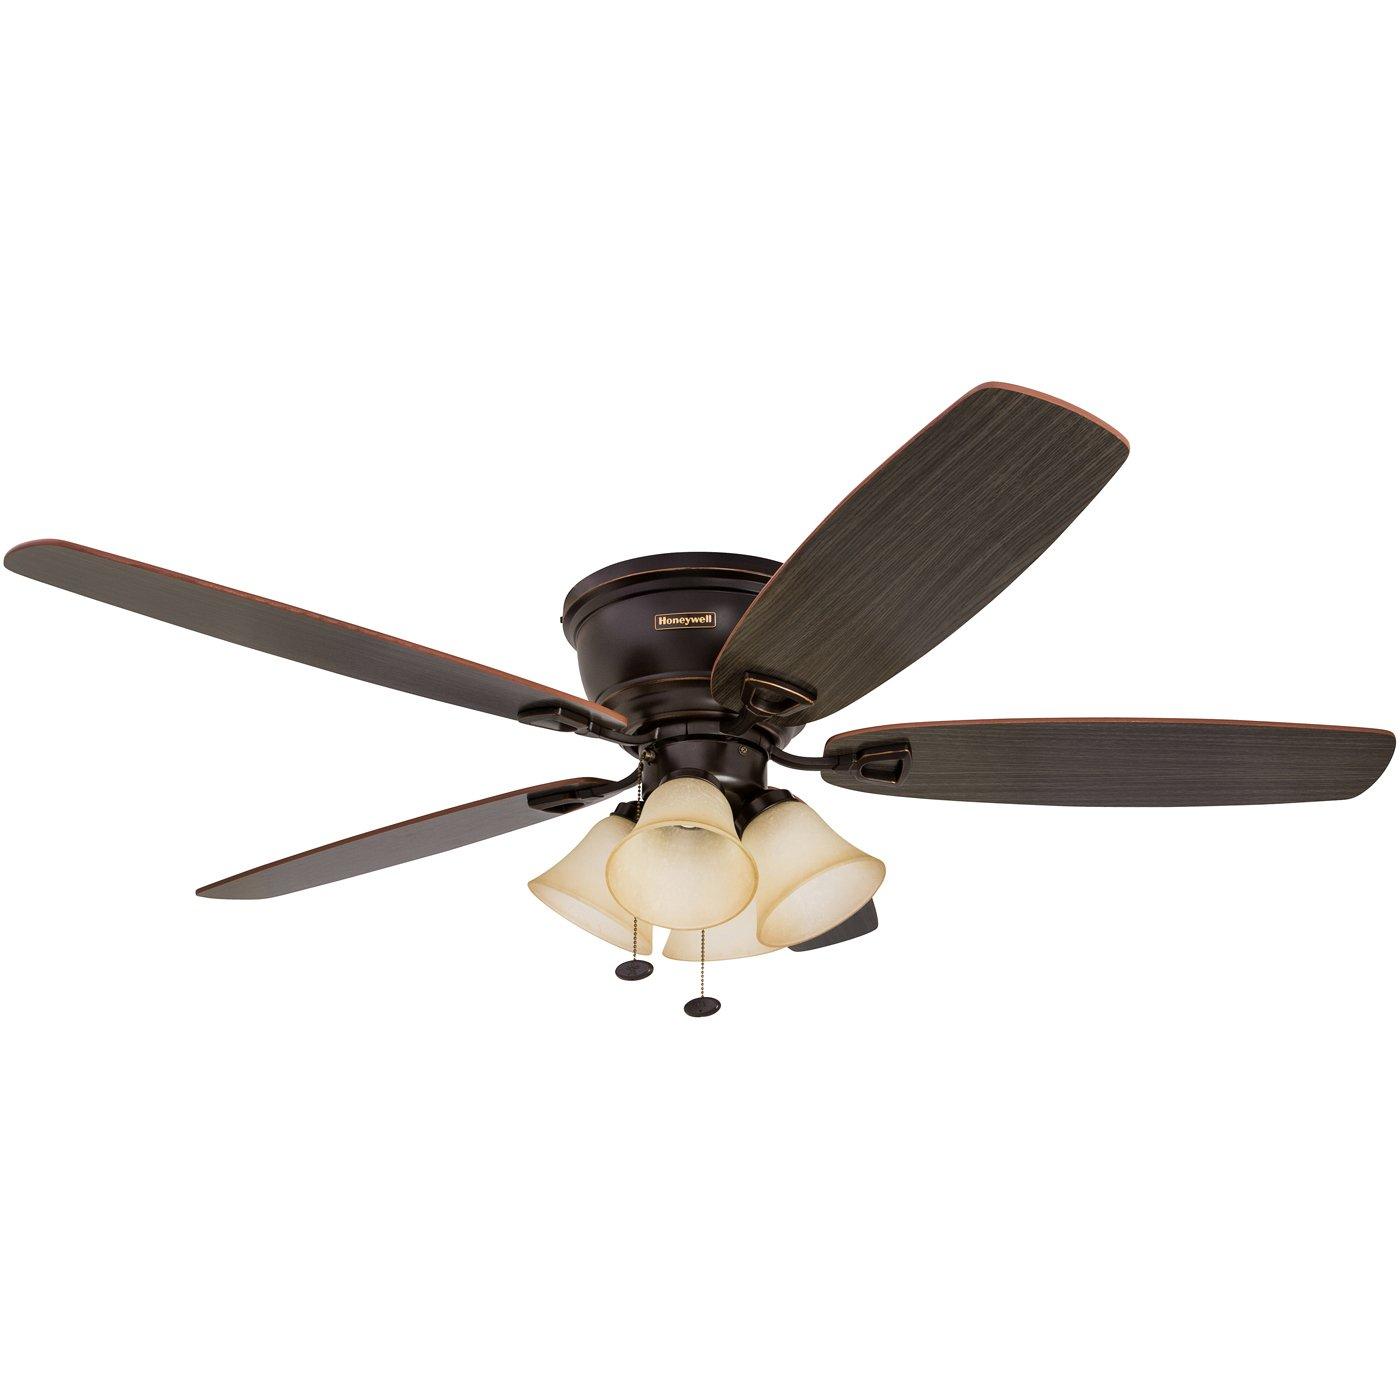 Honeywell Glen Alden 52-Inch Ceiling Fan with Sunset Shade Lights, Hugger/Flush Mount, Low Profile, Five Reversible Cimarron/Ironwood Blades, Oil-Rubbed Bronze